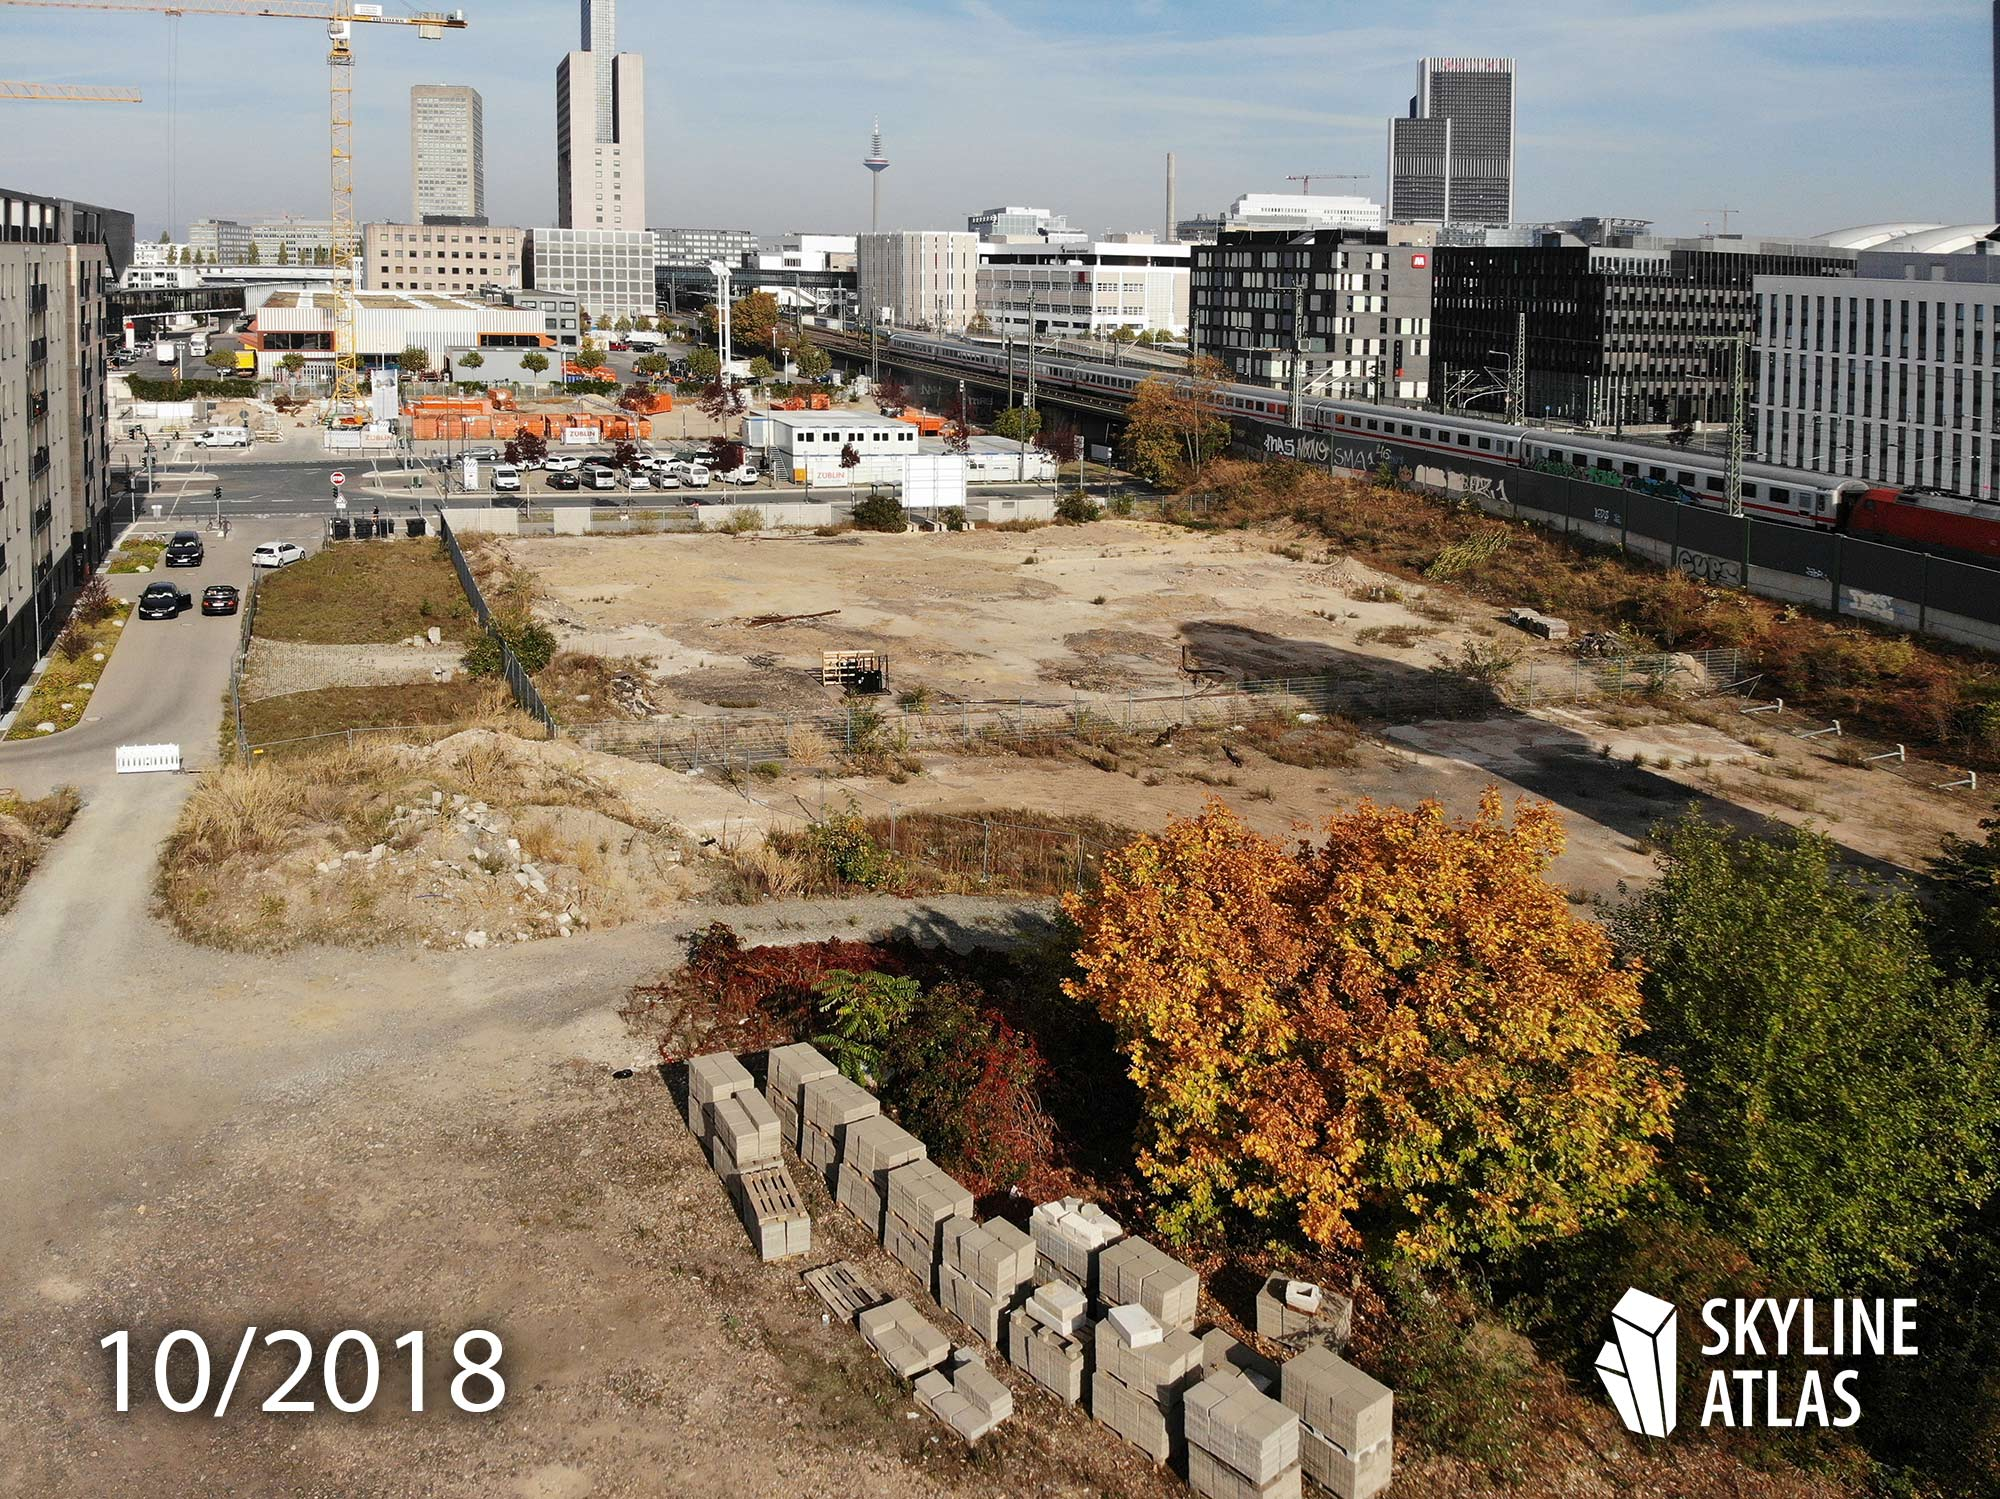 Porsche Design Tower - Frankfurt, Germany - Condominium Tower - Construction Site 2018